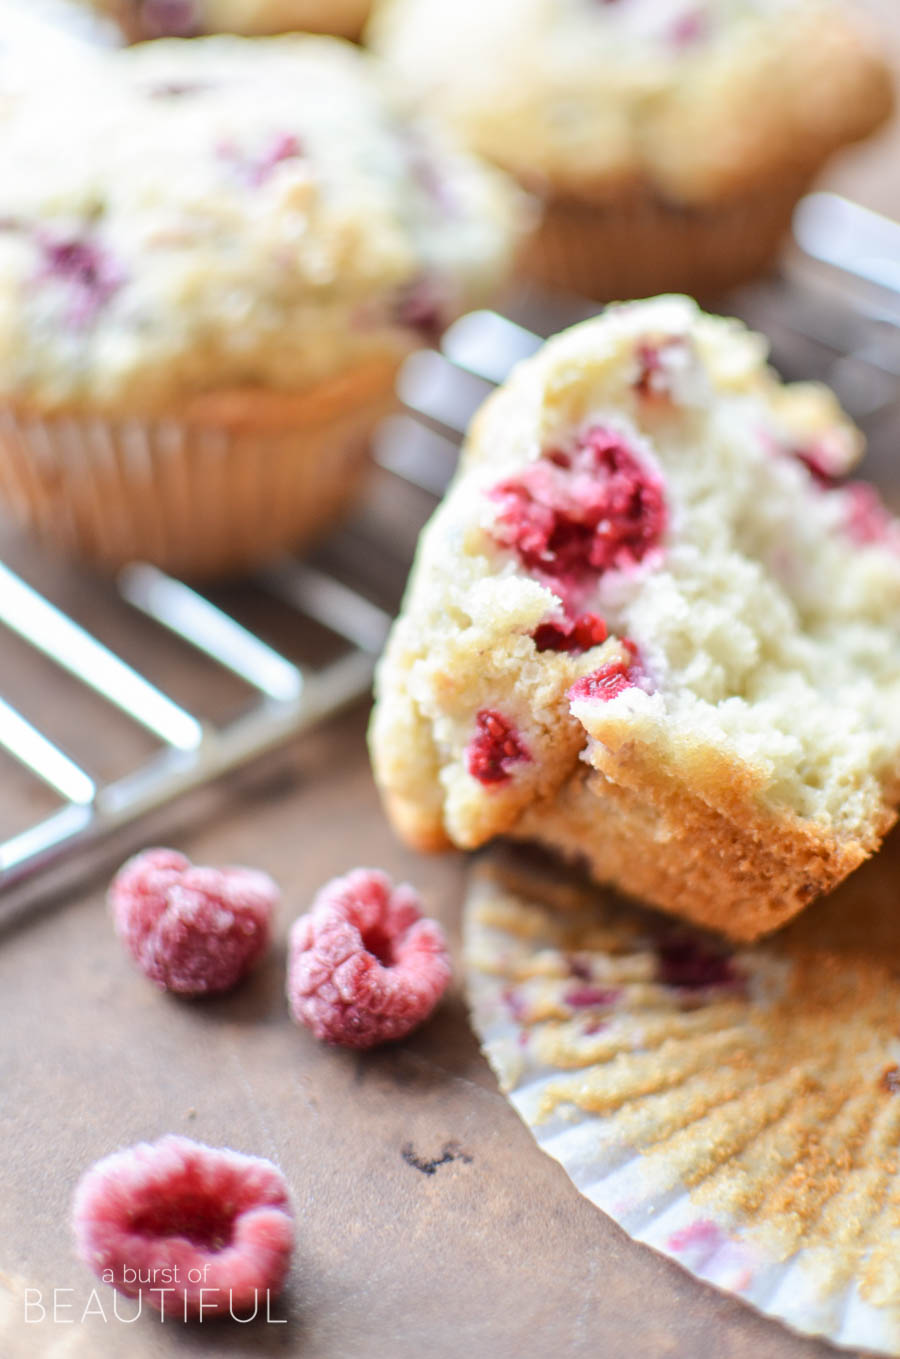 Raspberry-Muffins-A-Burst-of-Beautiful-5